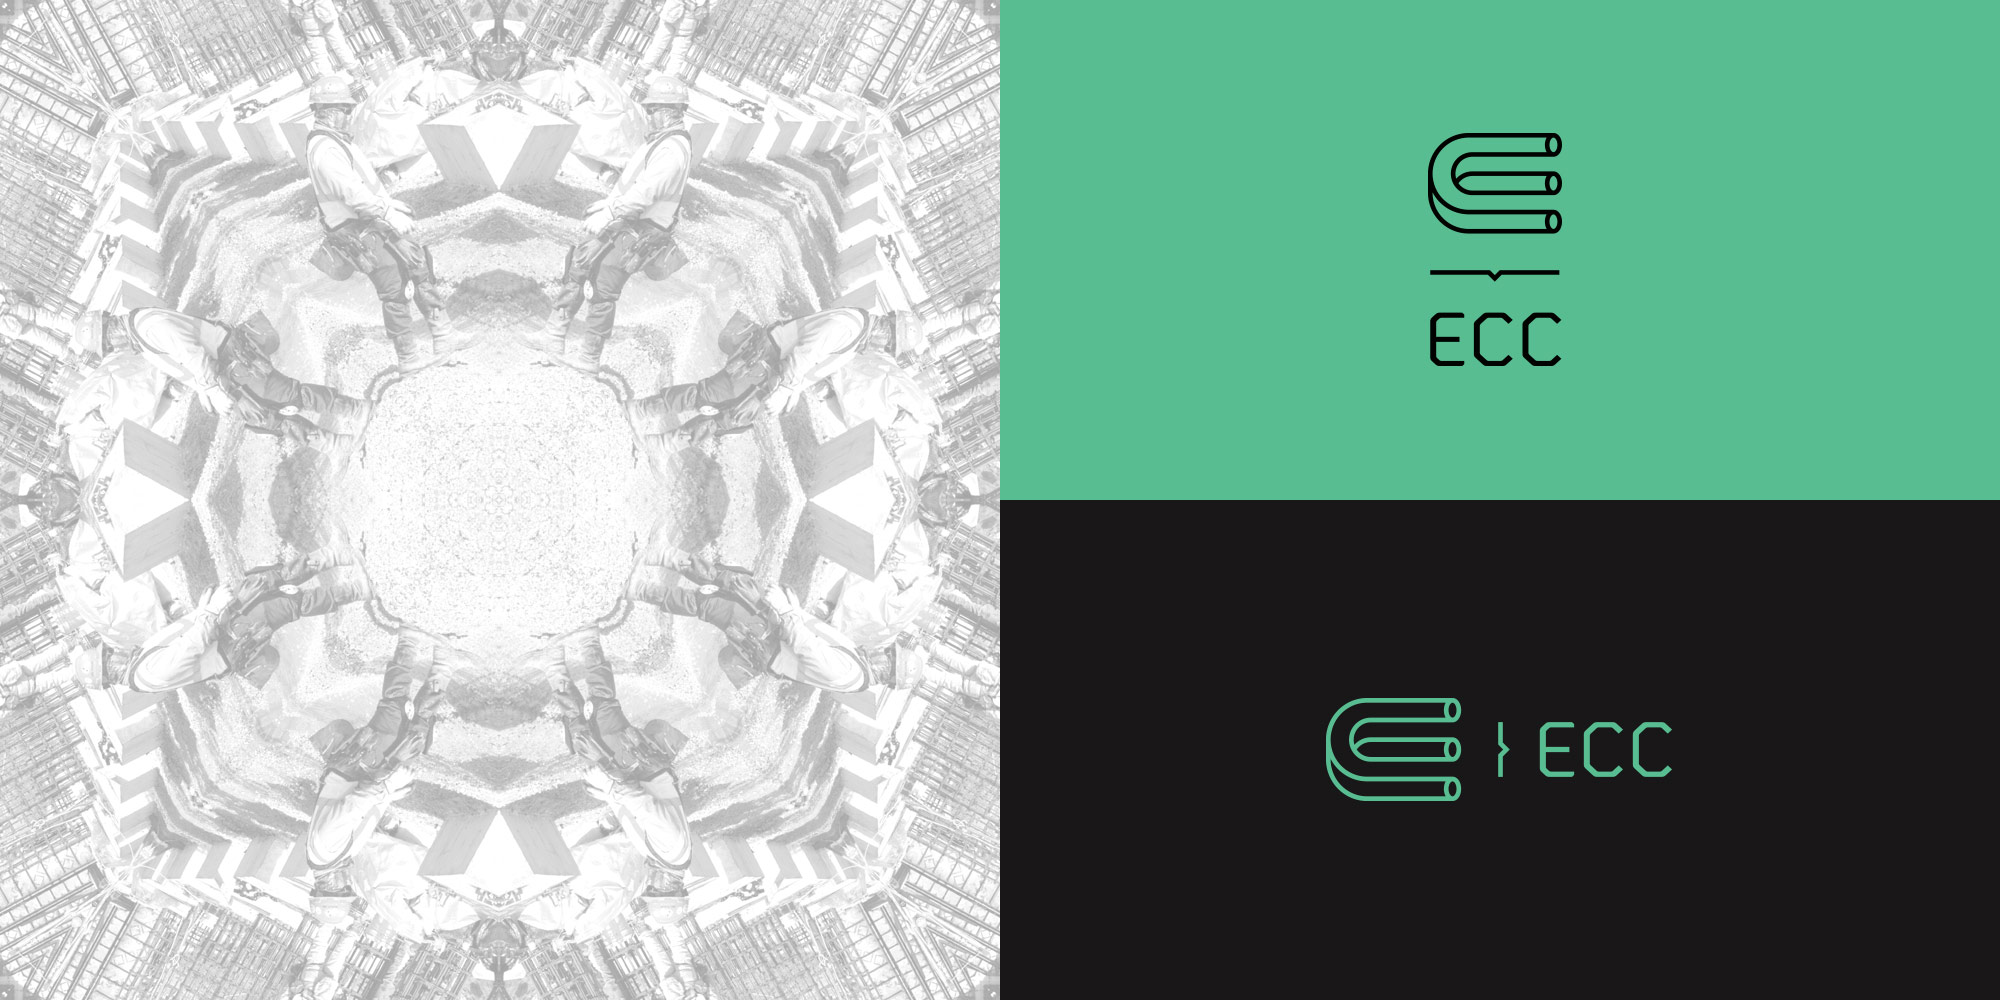 ECC_Logos_OnlyJones